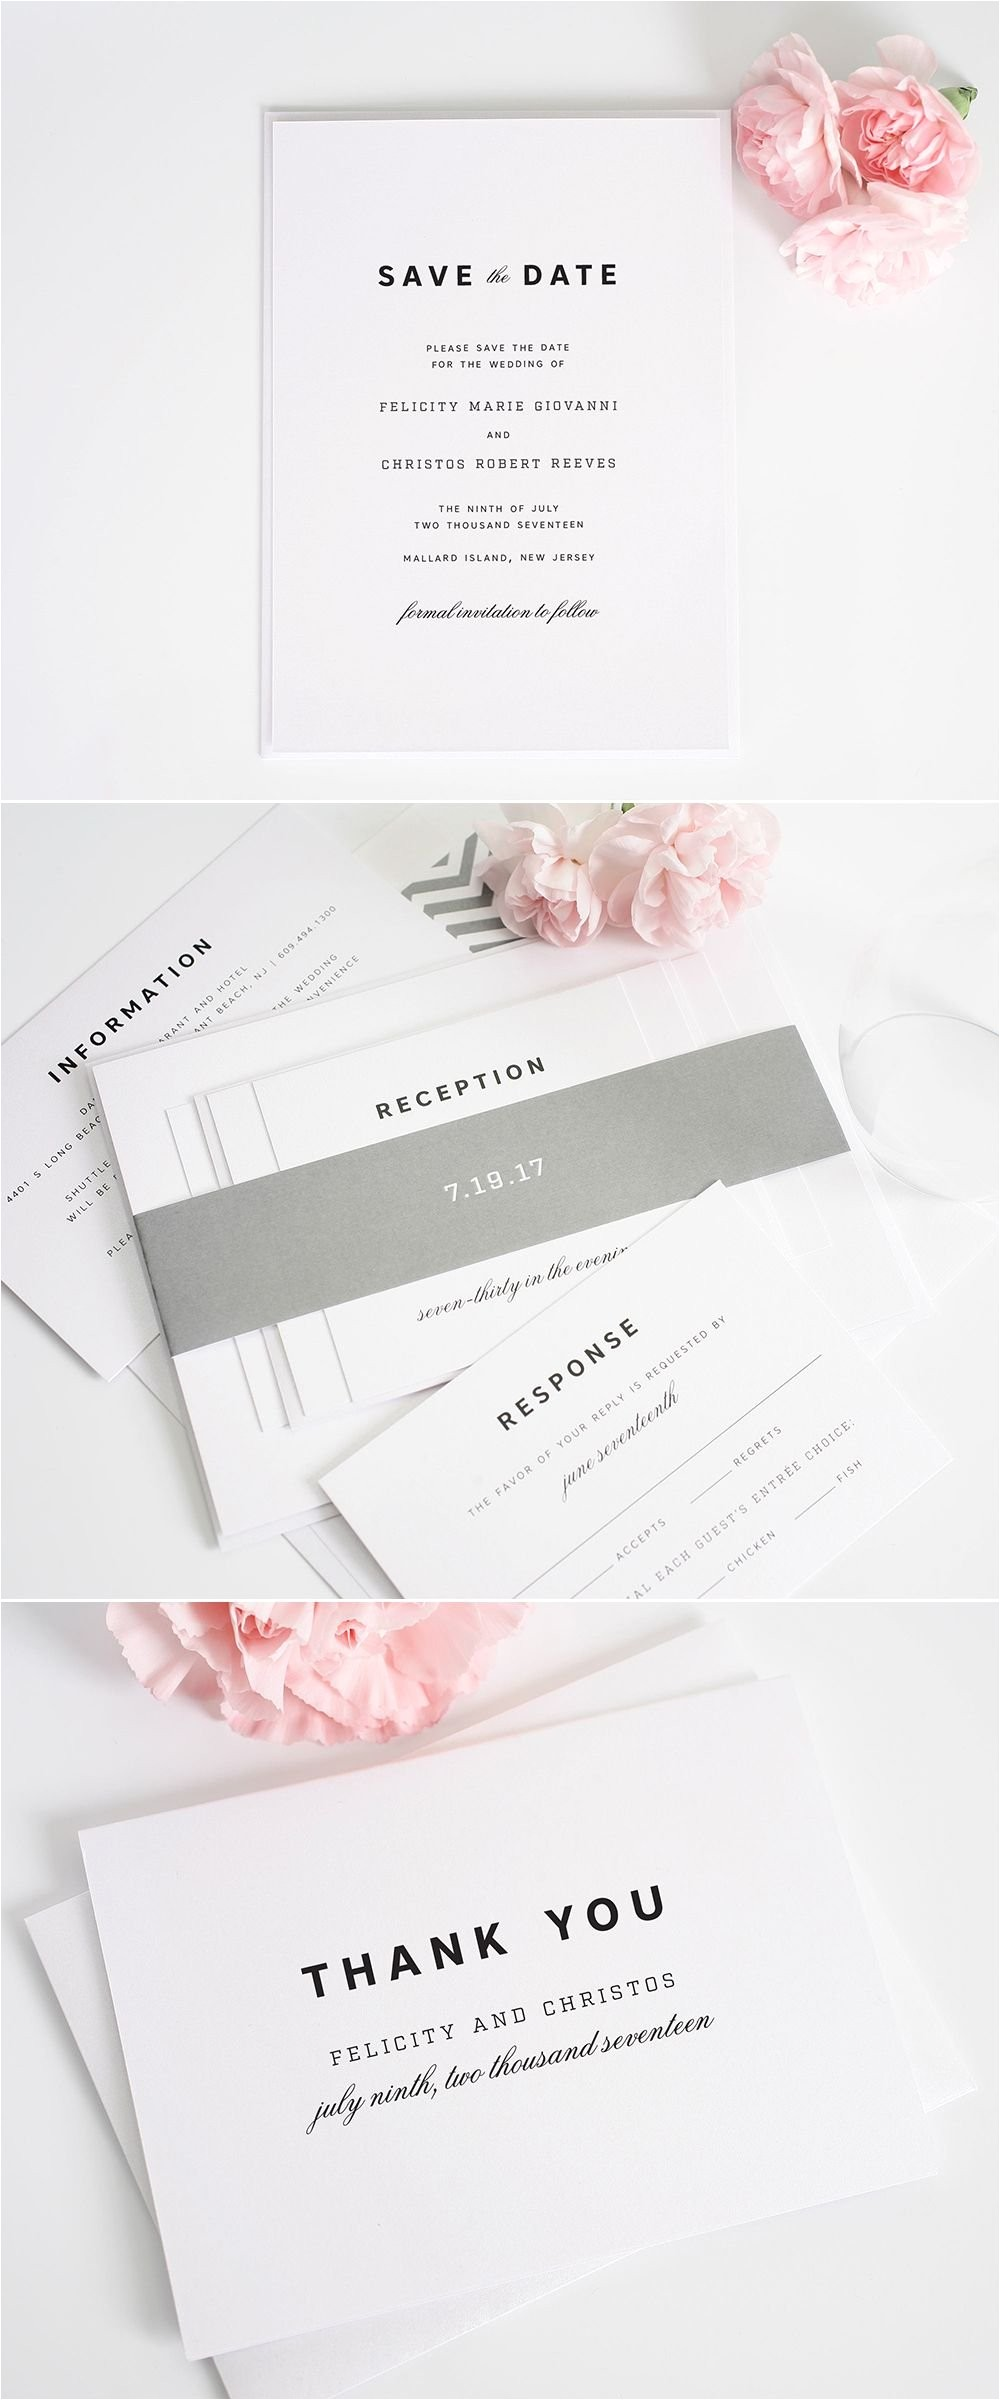 Truly Romantic Wedding Invitations 41 Inspirational Truly Romantic Wedding Invitations Images